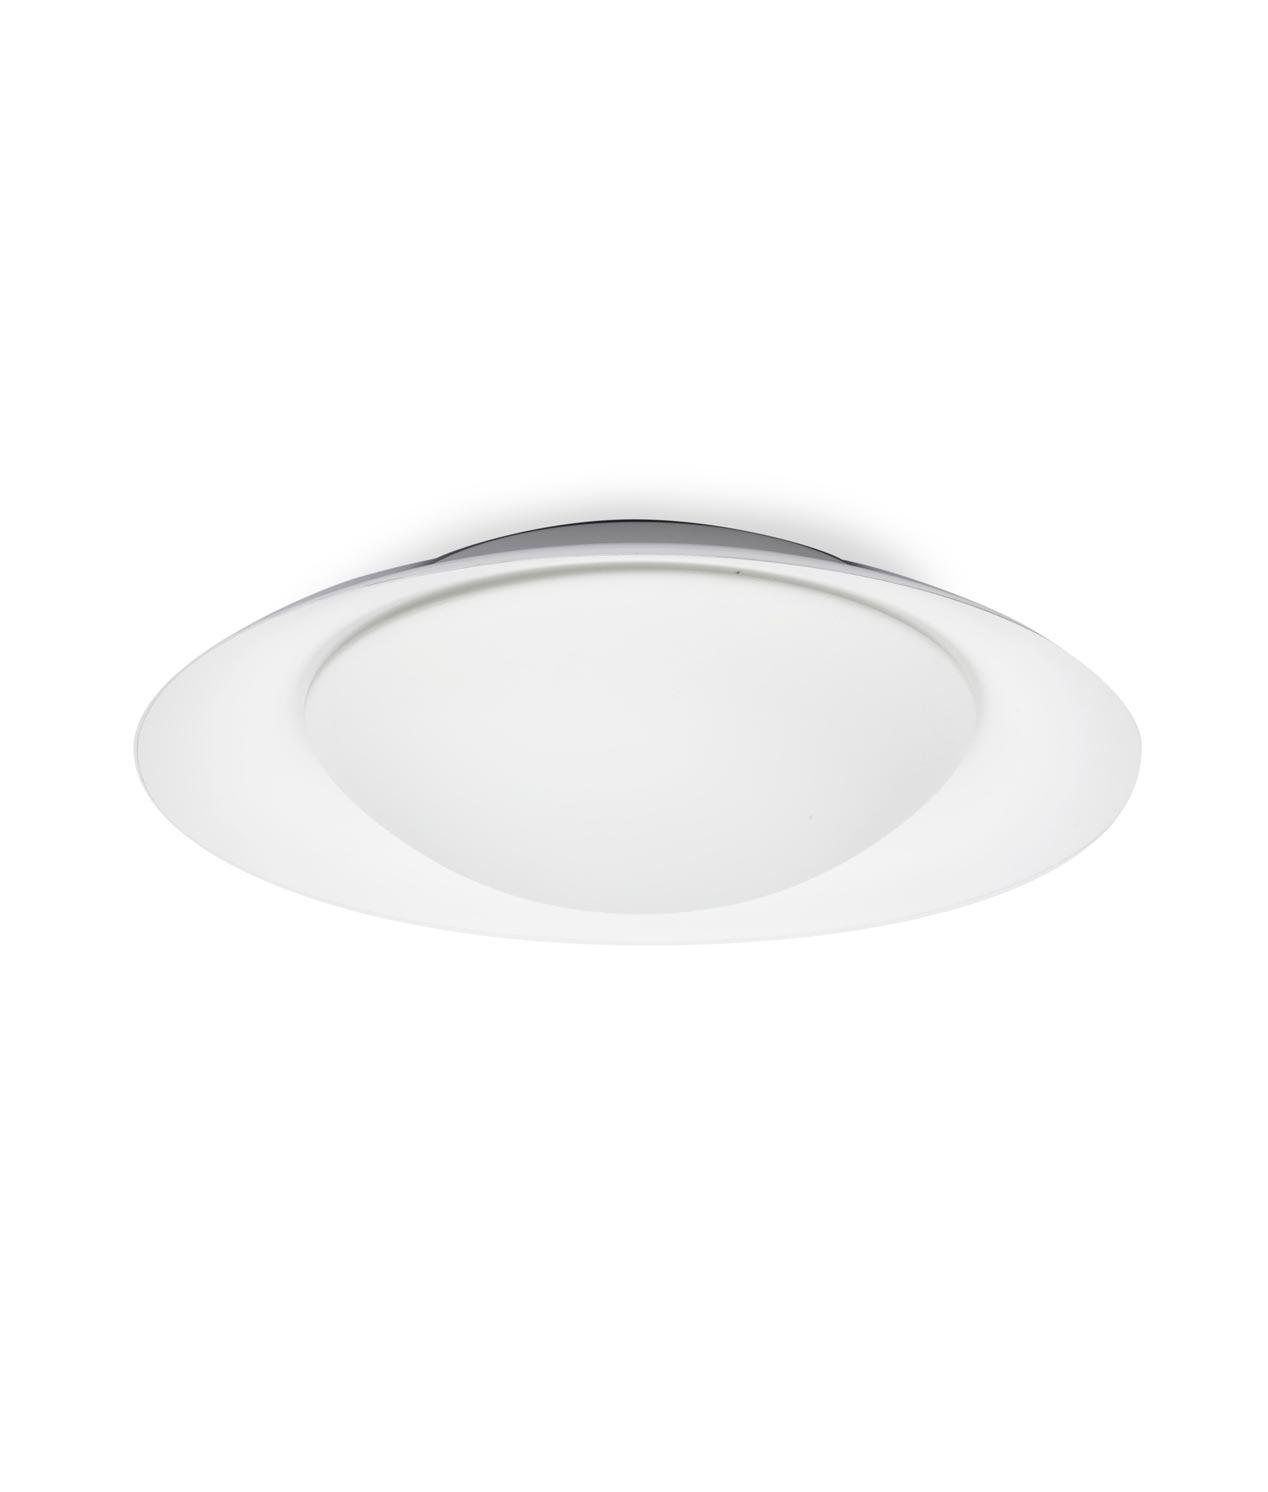 Plafón grande blanco 20W SIDE LED